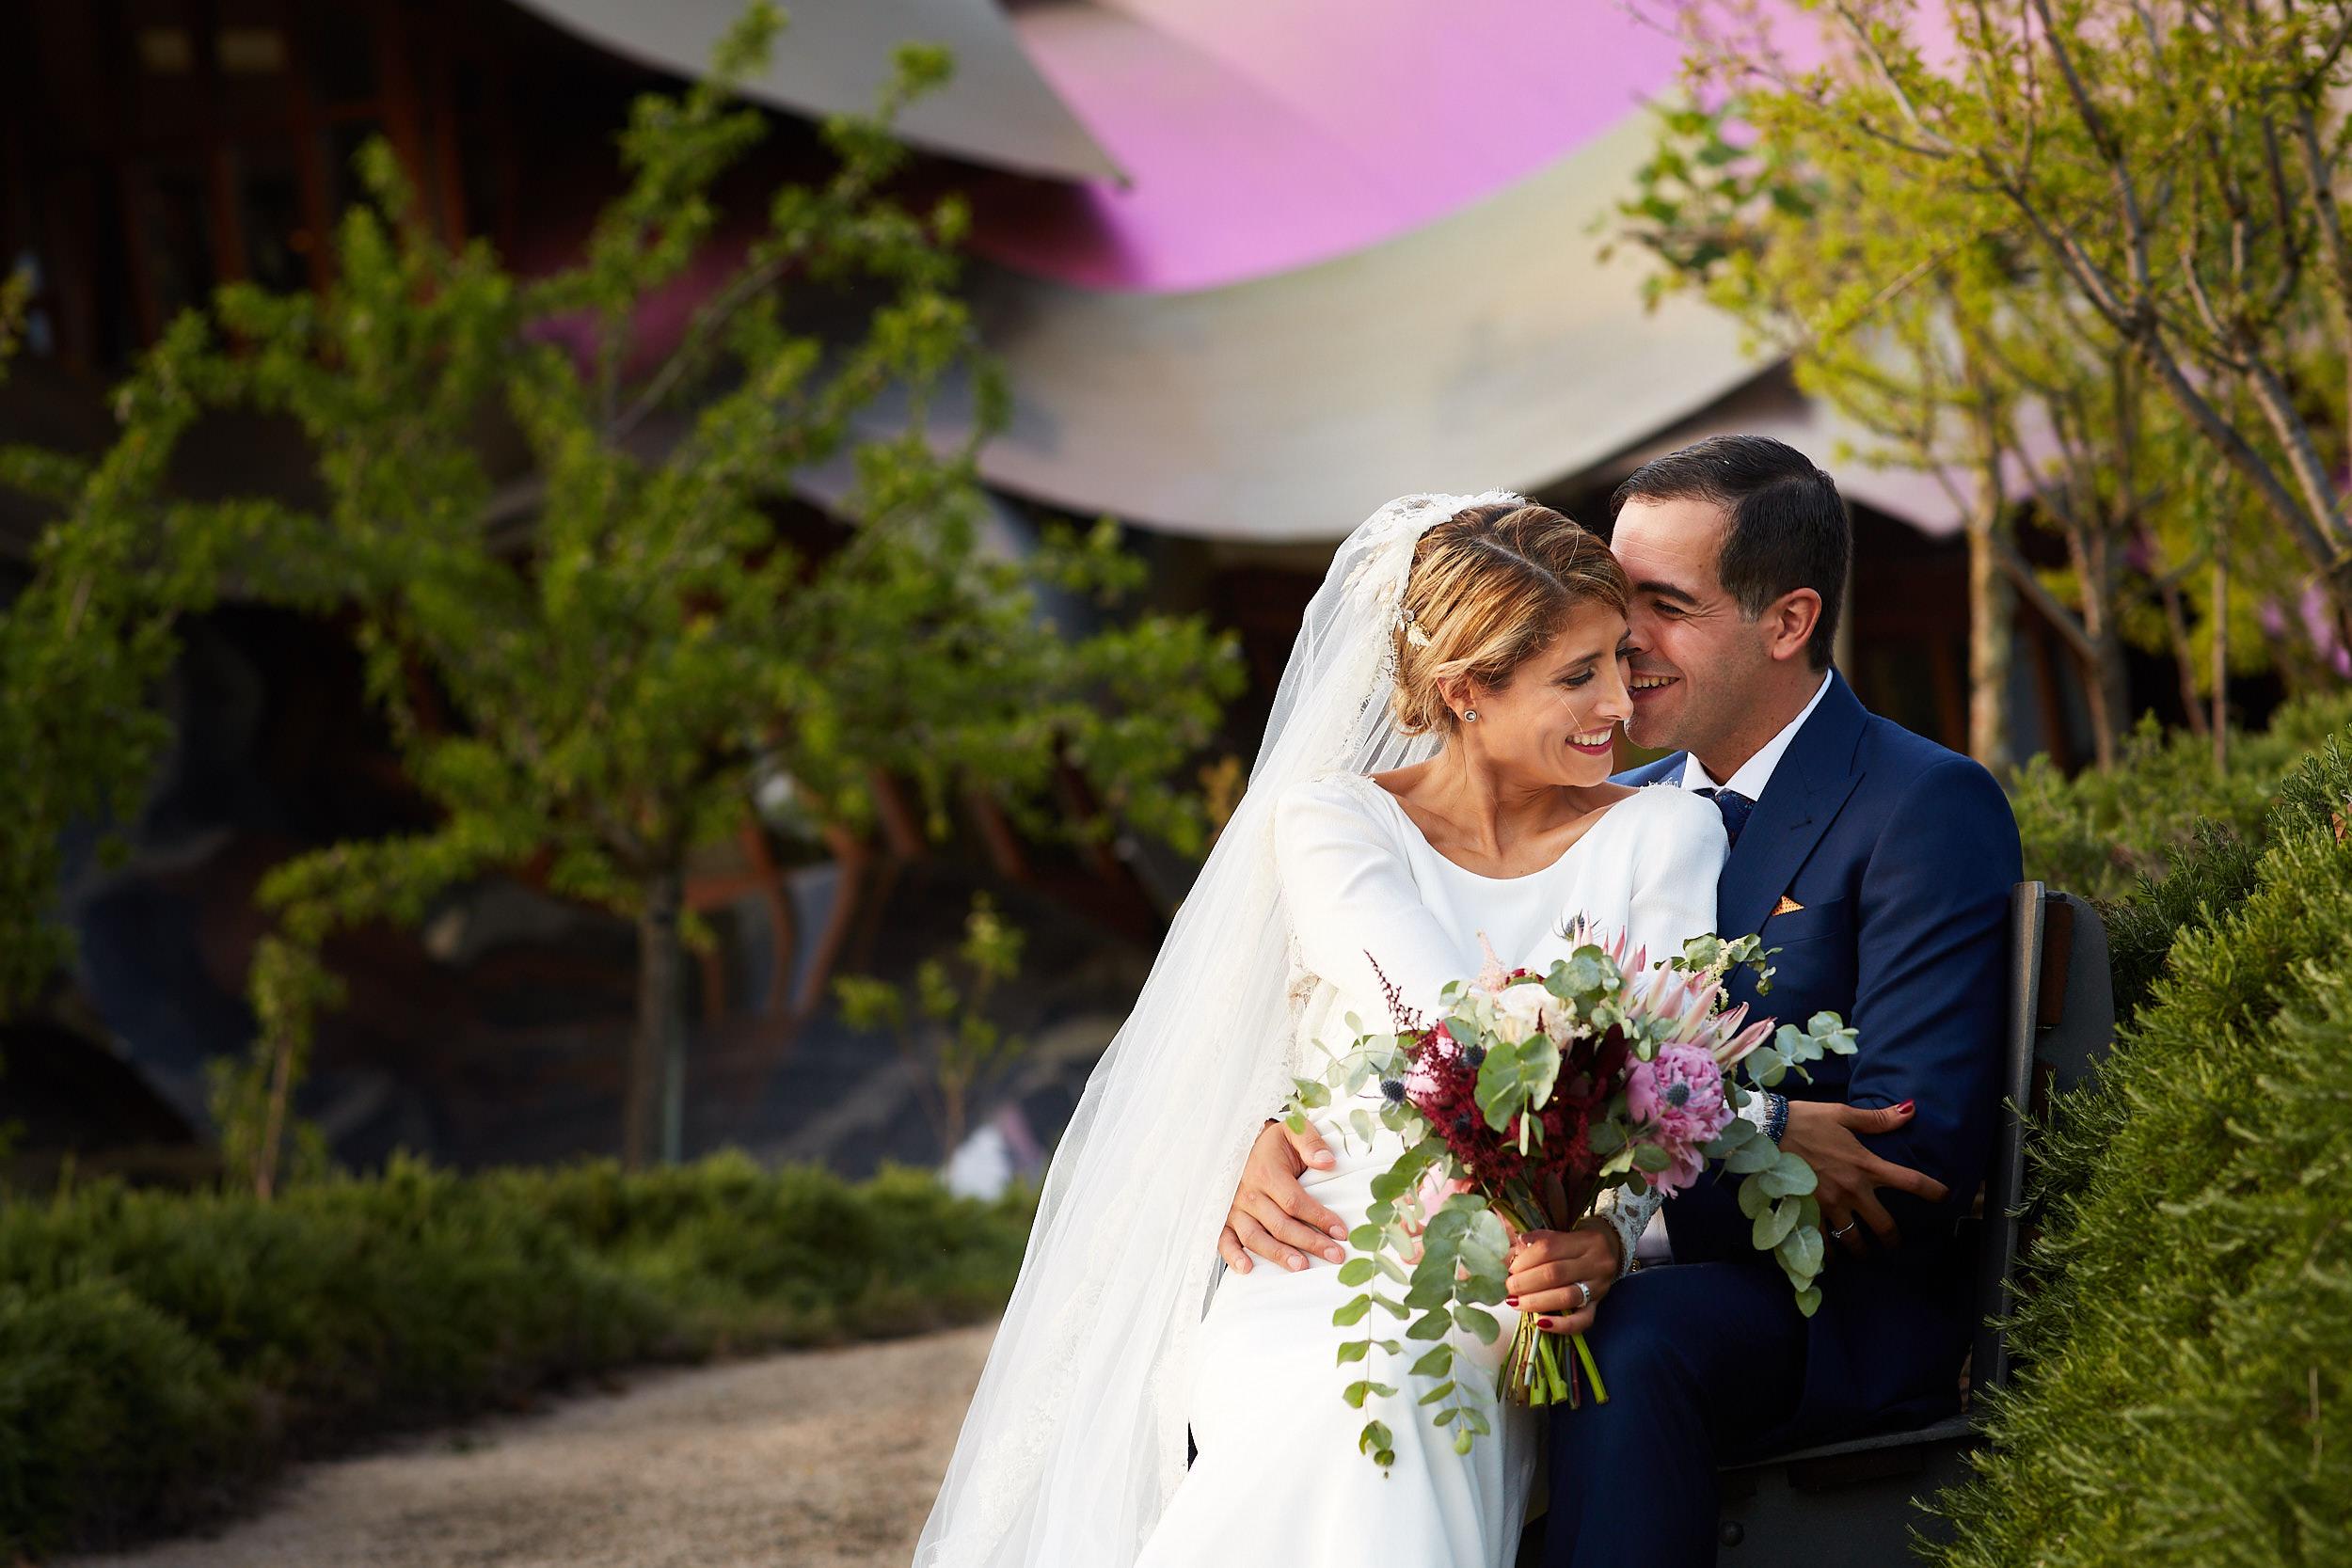 27/7/18 Laura & Aitor, Wedding Hotel Marqués de Riscal, Elciego, Álava, Basque Country, Spain. Photo by James Sturcke | sturcke.org